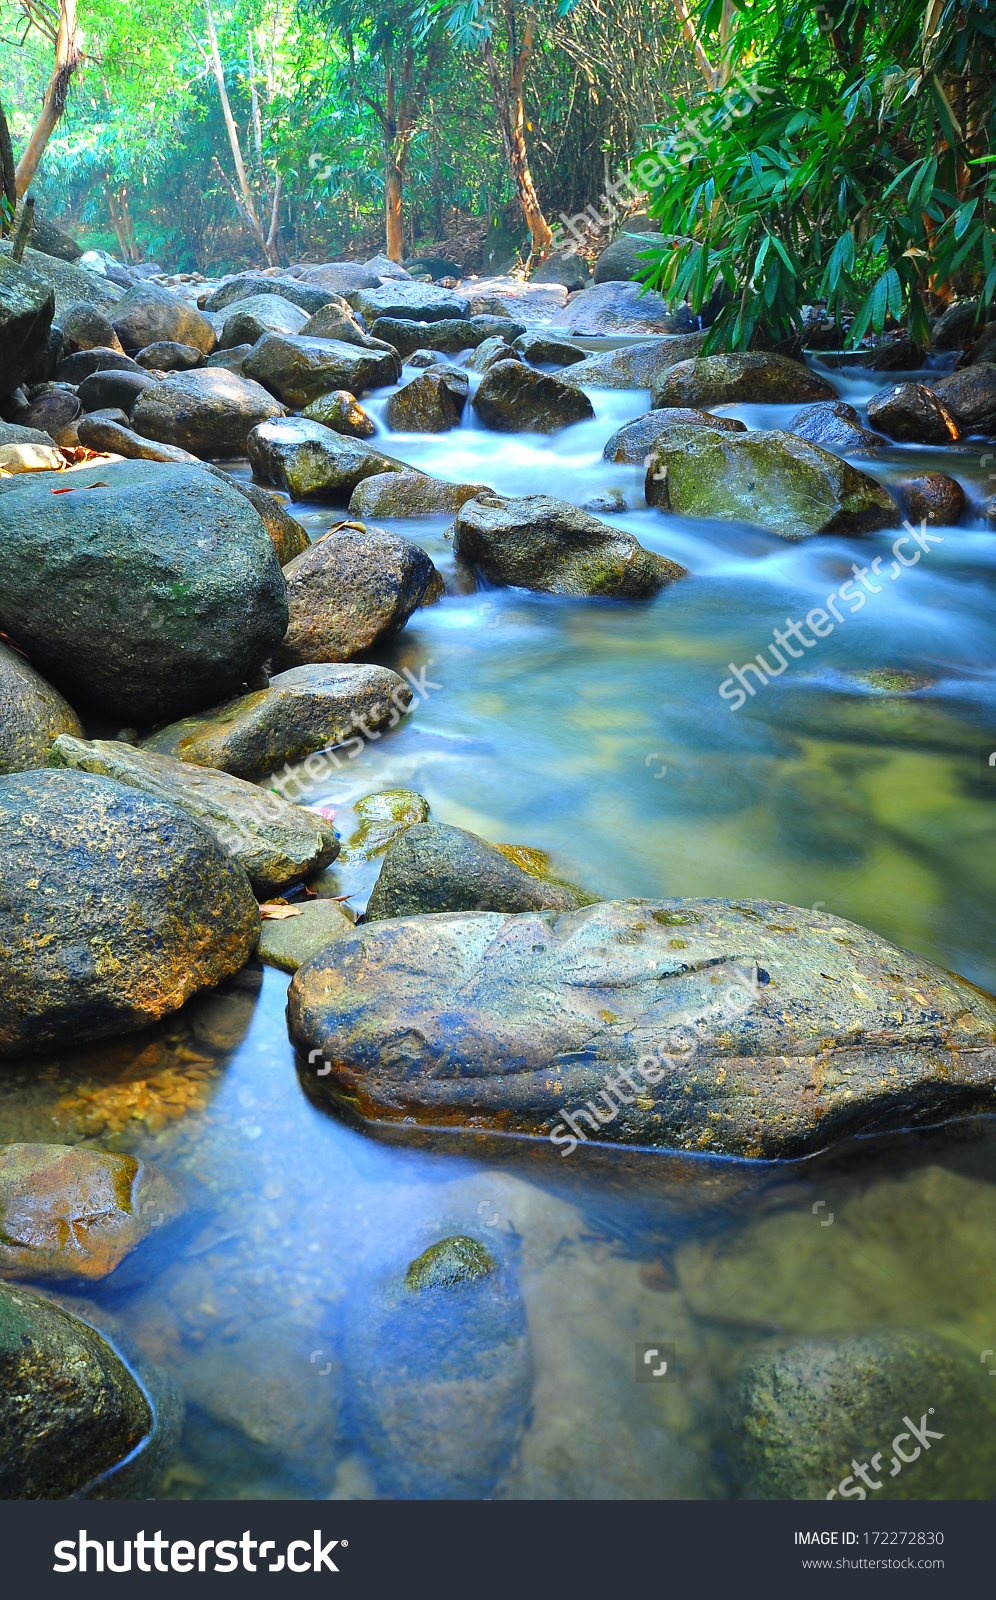 Water Flow Through Rocks Shallow Stream Stock Photo 172272830.